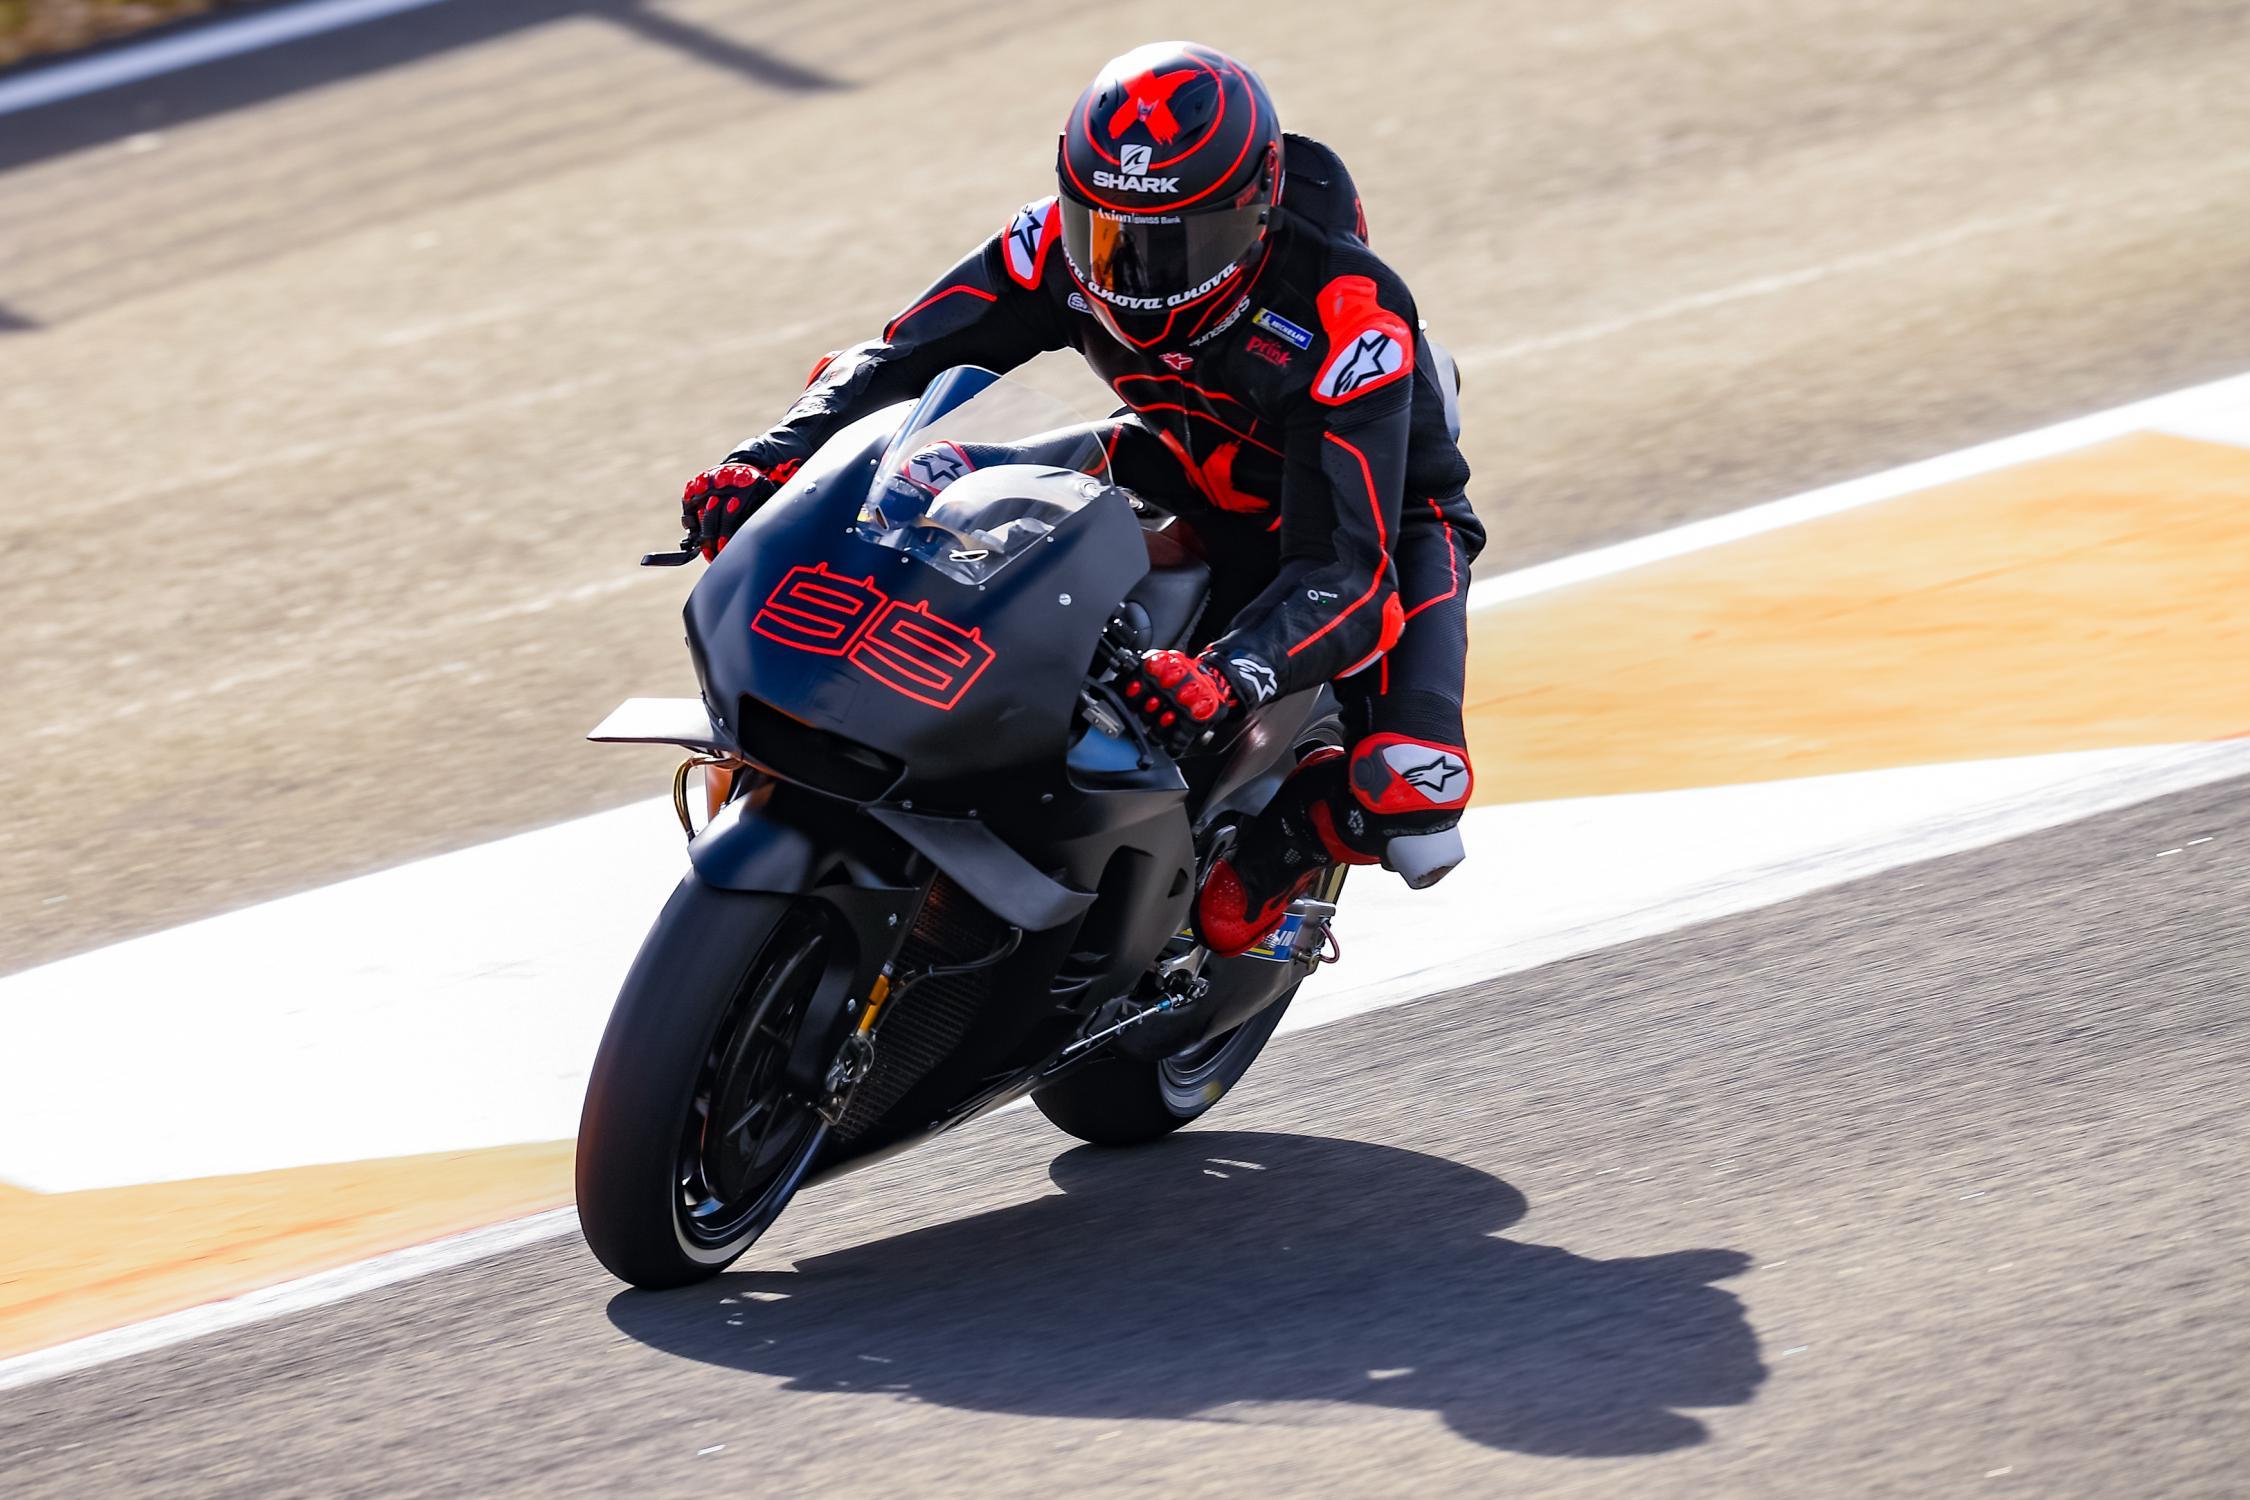 MOTO GP 2019 COMPÉTITIONS - Page 3 Jorge-lorenzo-valencia-test-motogp-2018